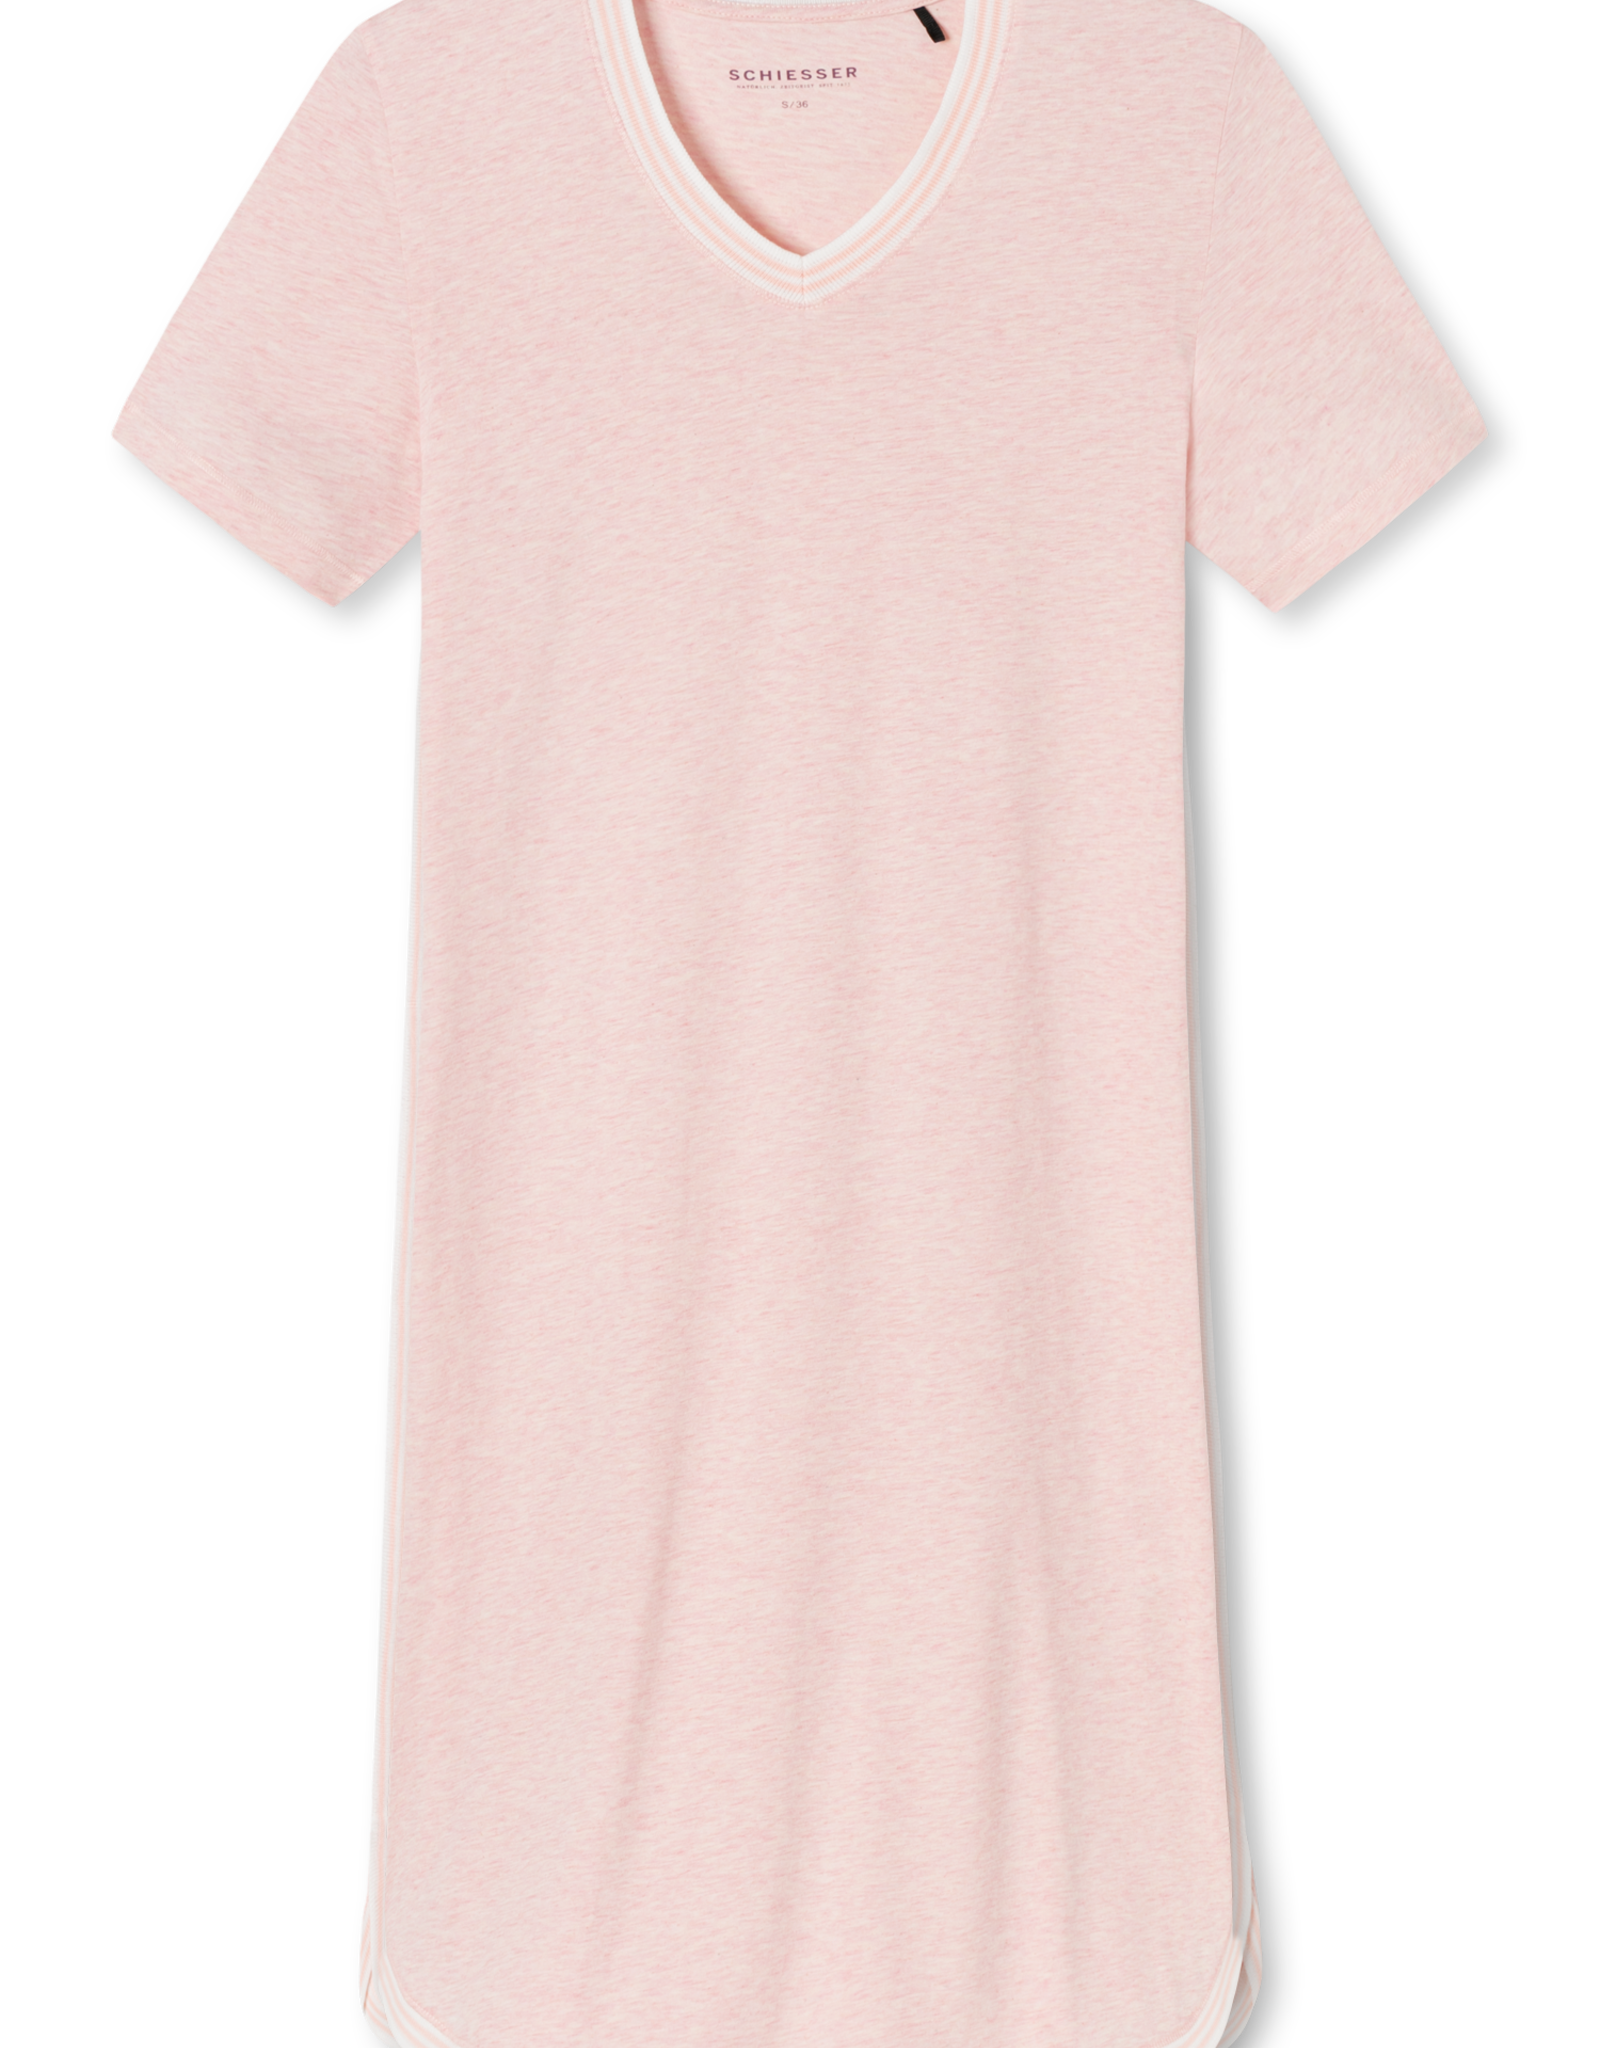 Schiesser Sleepshirt 1/2, 169523-533